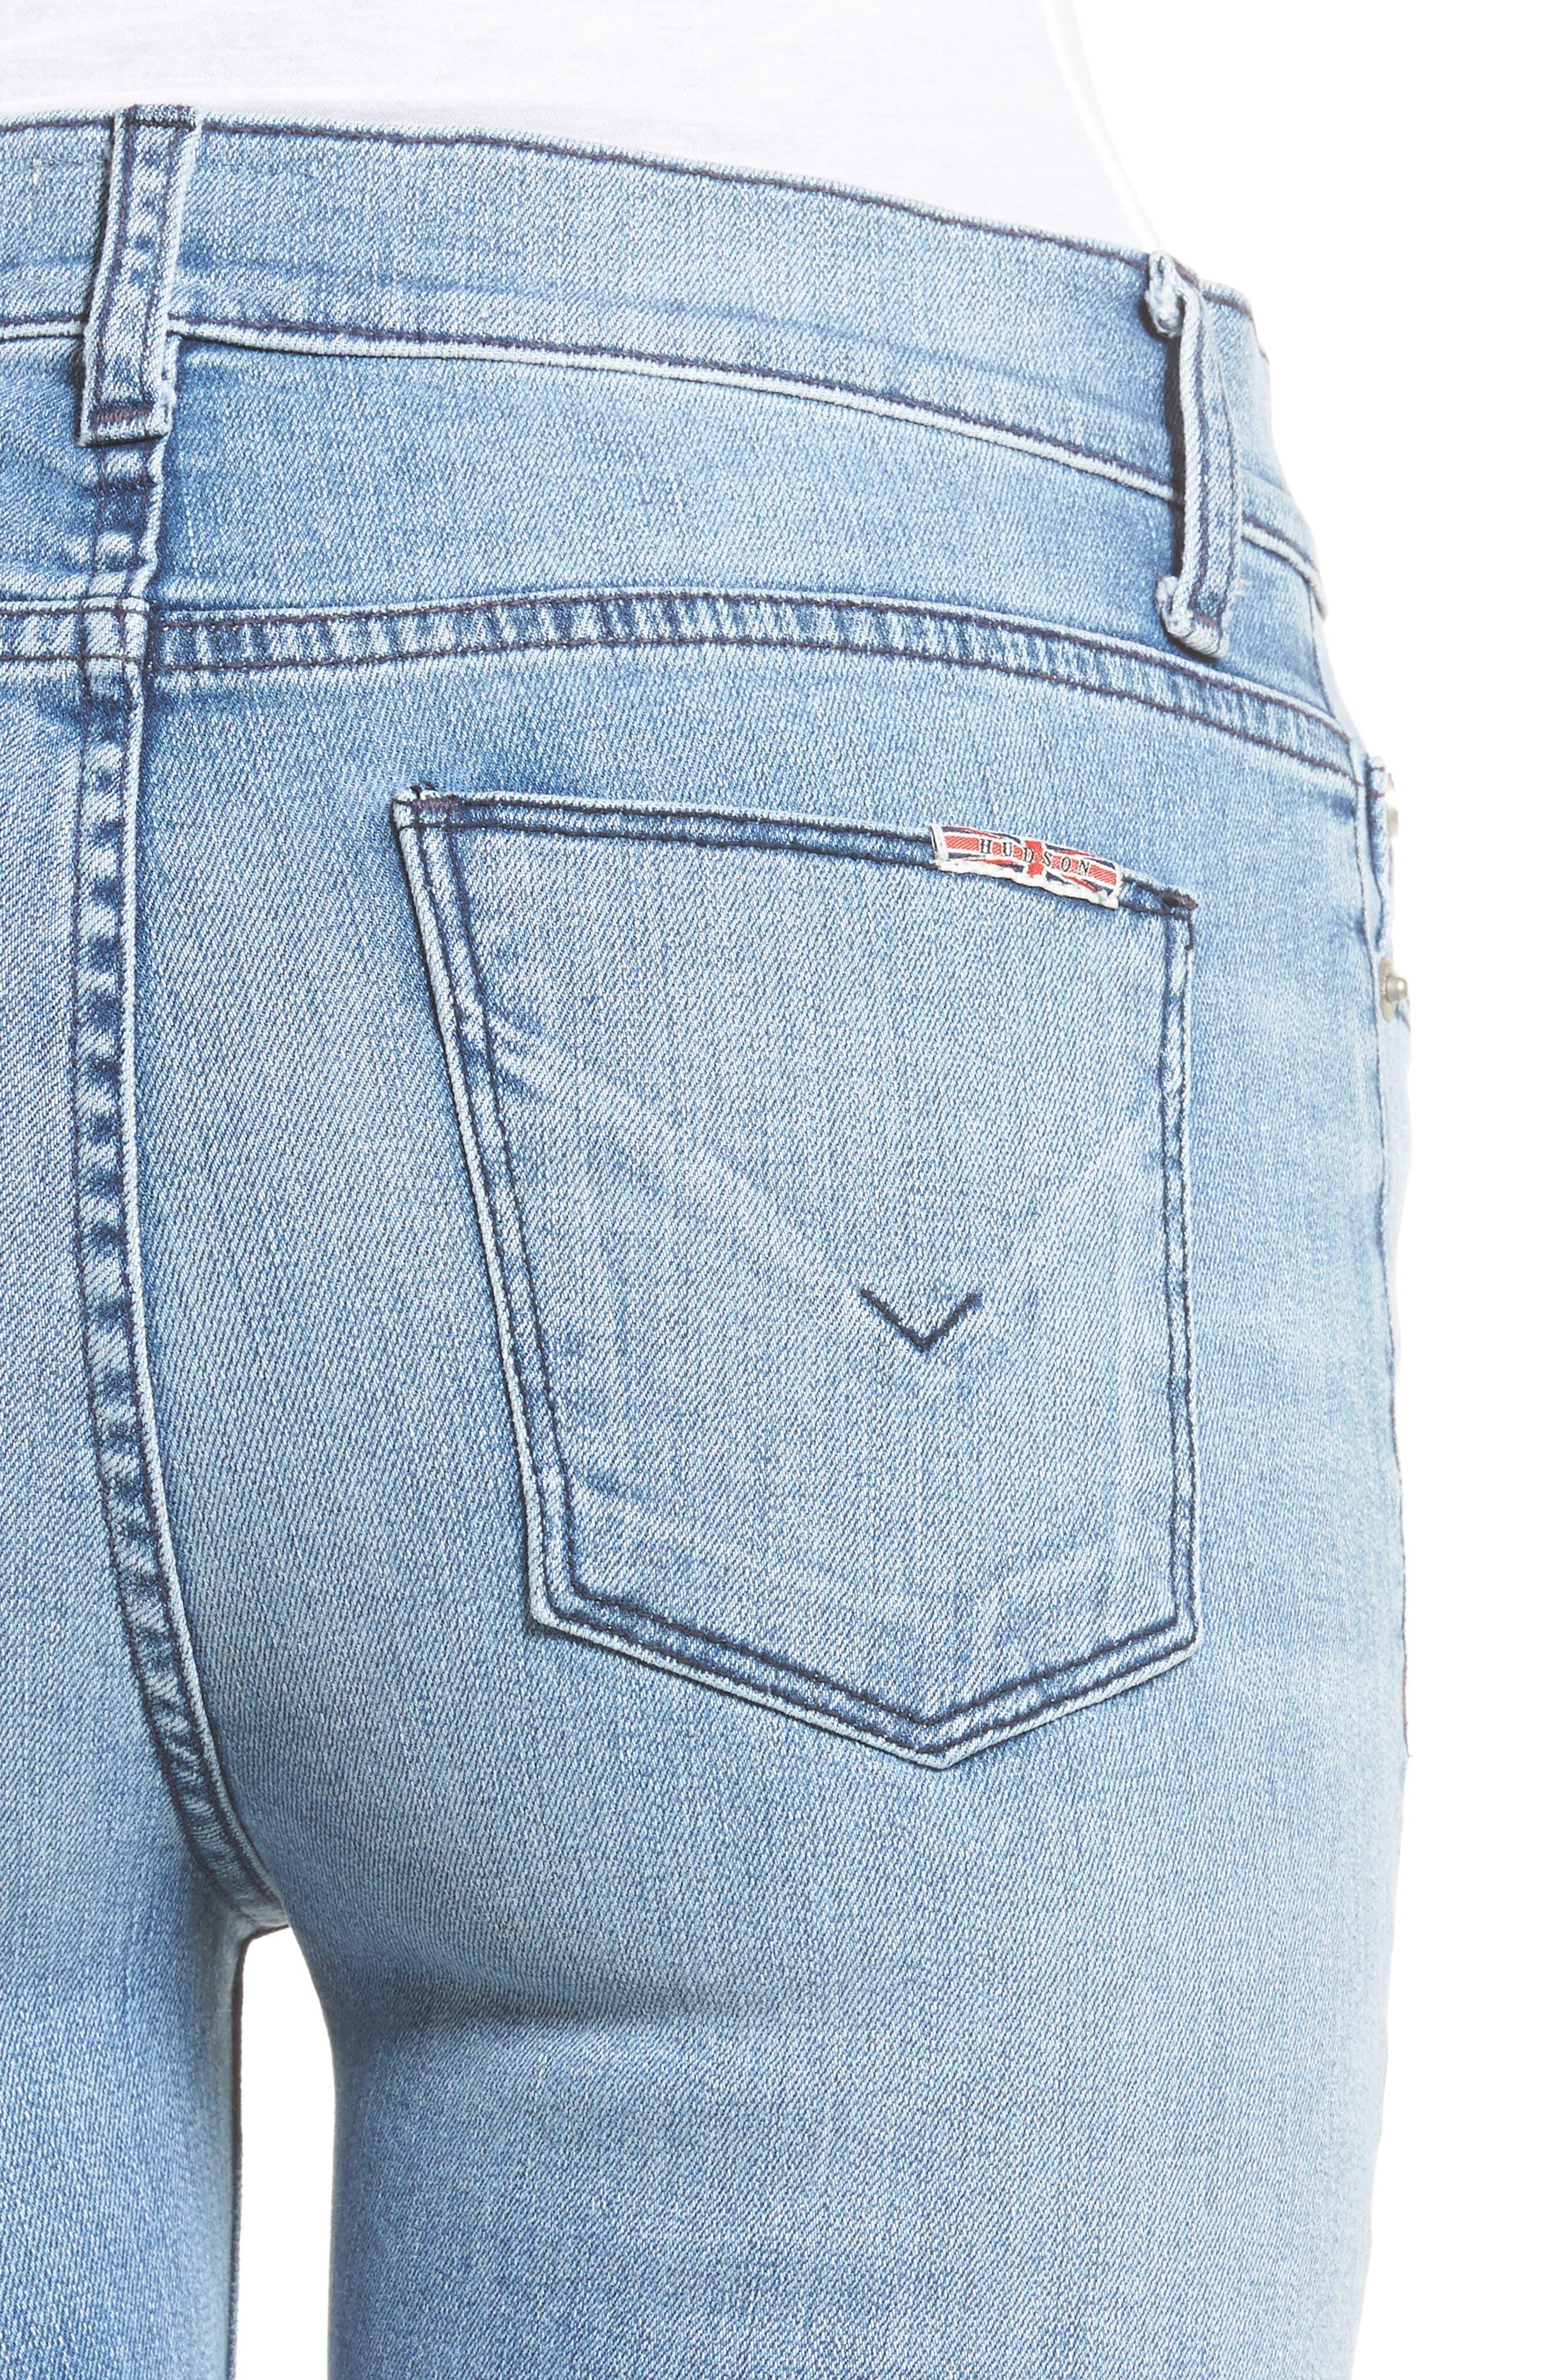 Ciara High Waist Skinny Jeans,                             Alternate thumbnail 8, color,